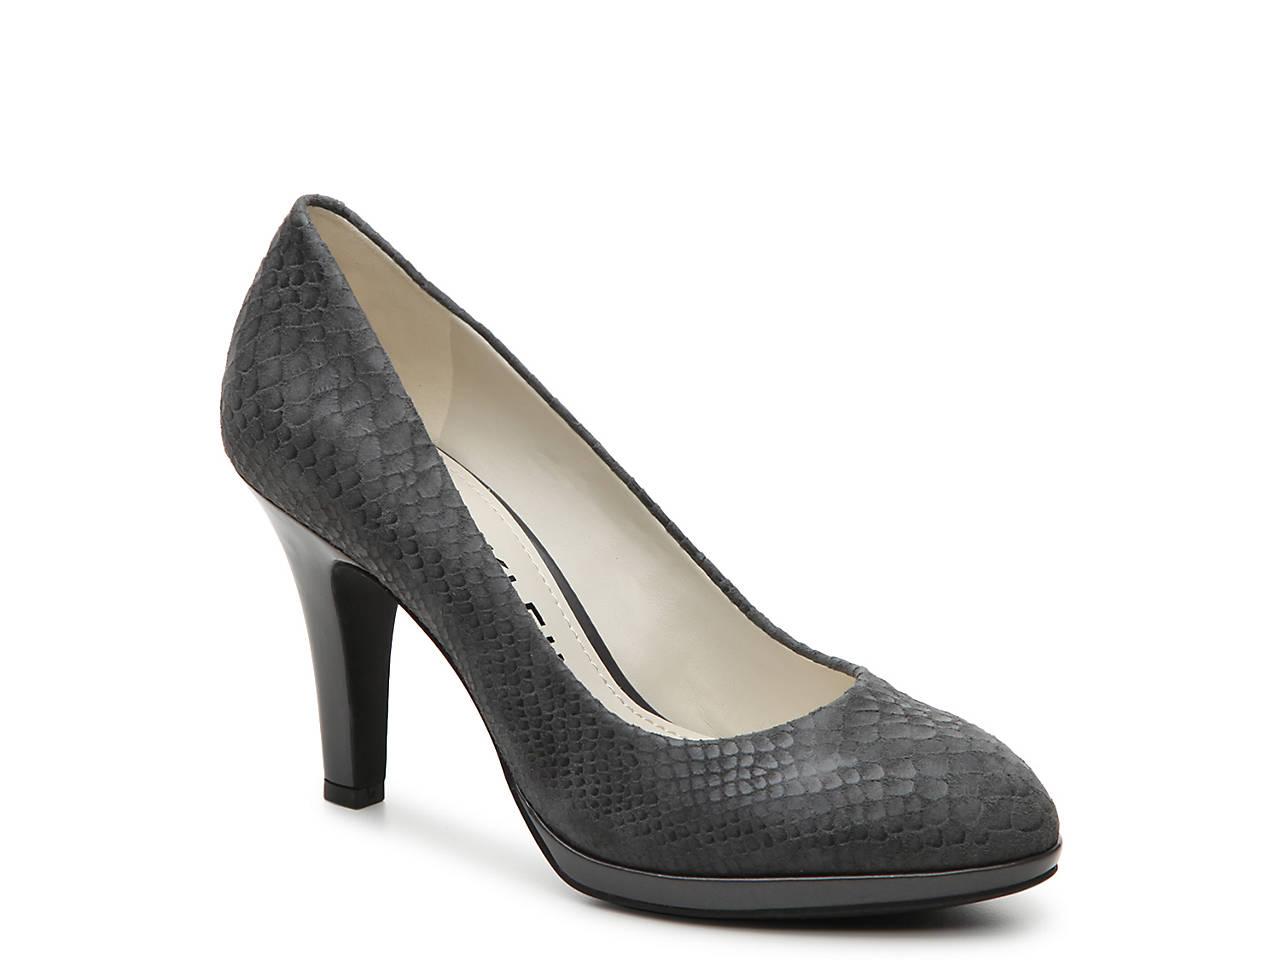 e99818c2e90 Anne Klein Lolana Platform Pump Women s Shoes